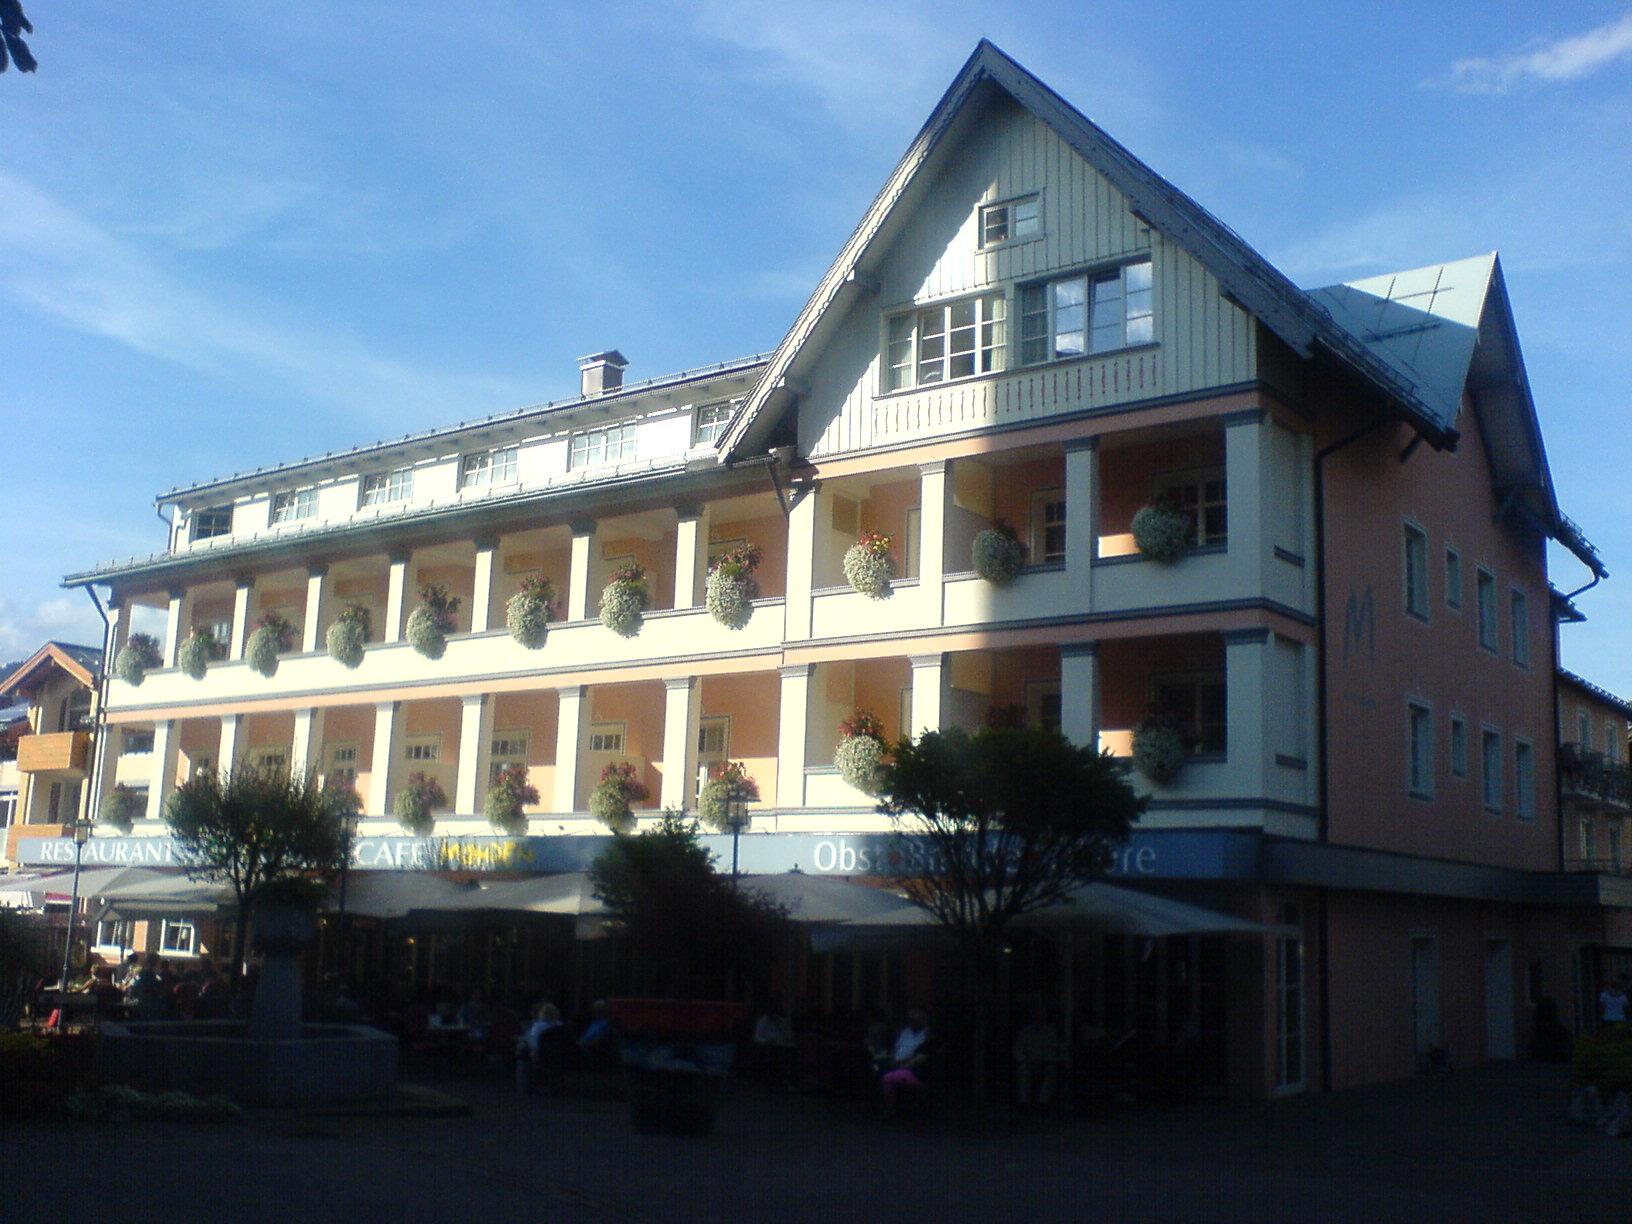 Hotel Oberstdorf Oberstdorf Bewertung